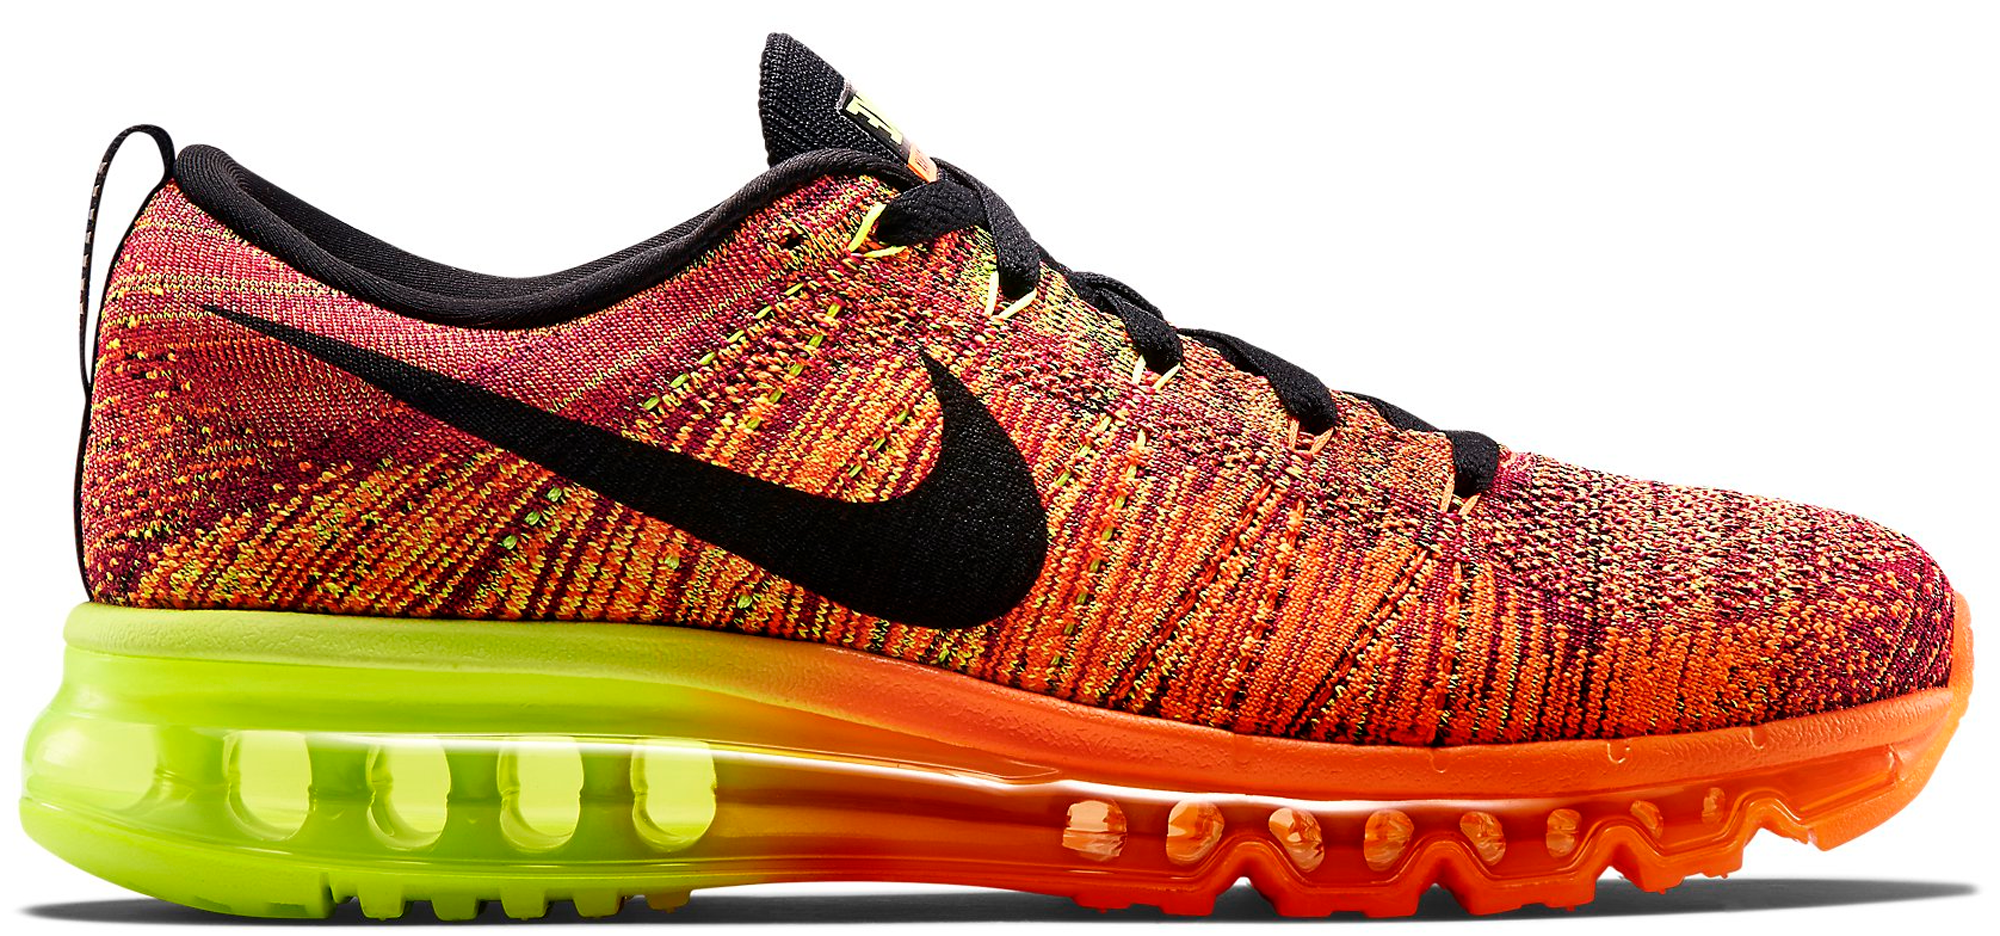 Nike Flyknit Max Total Orange Fireberry